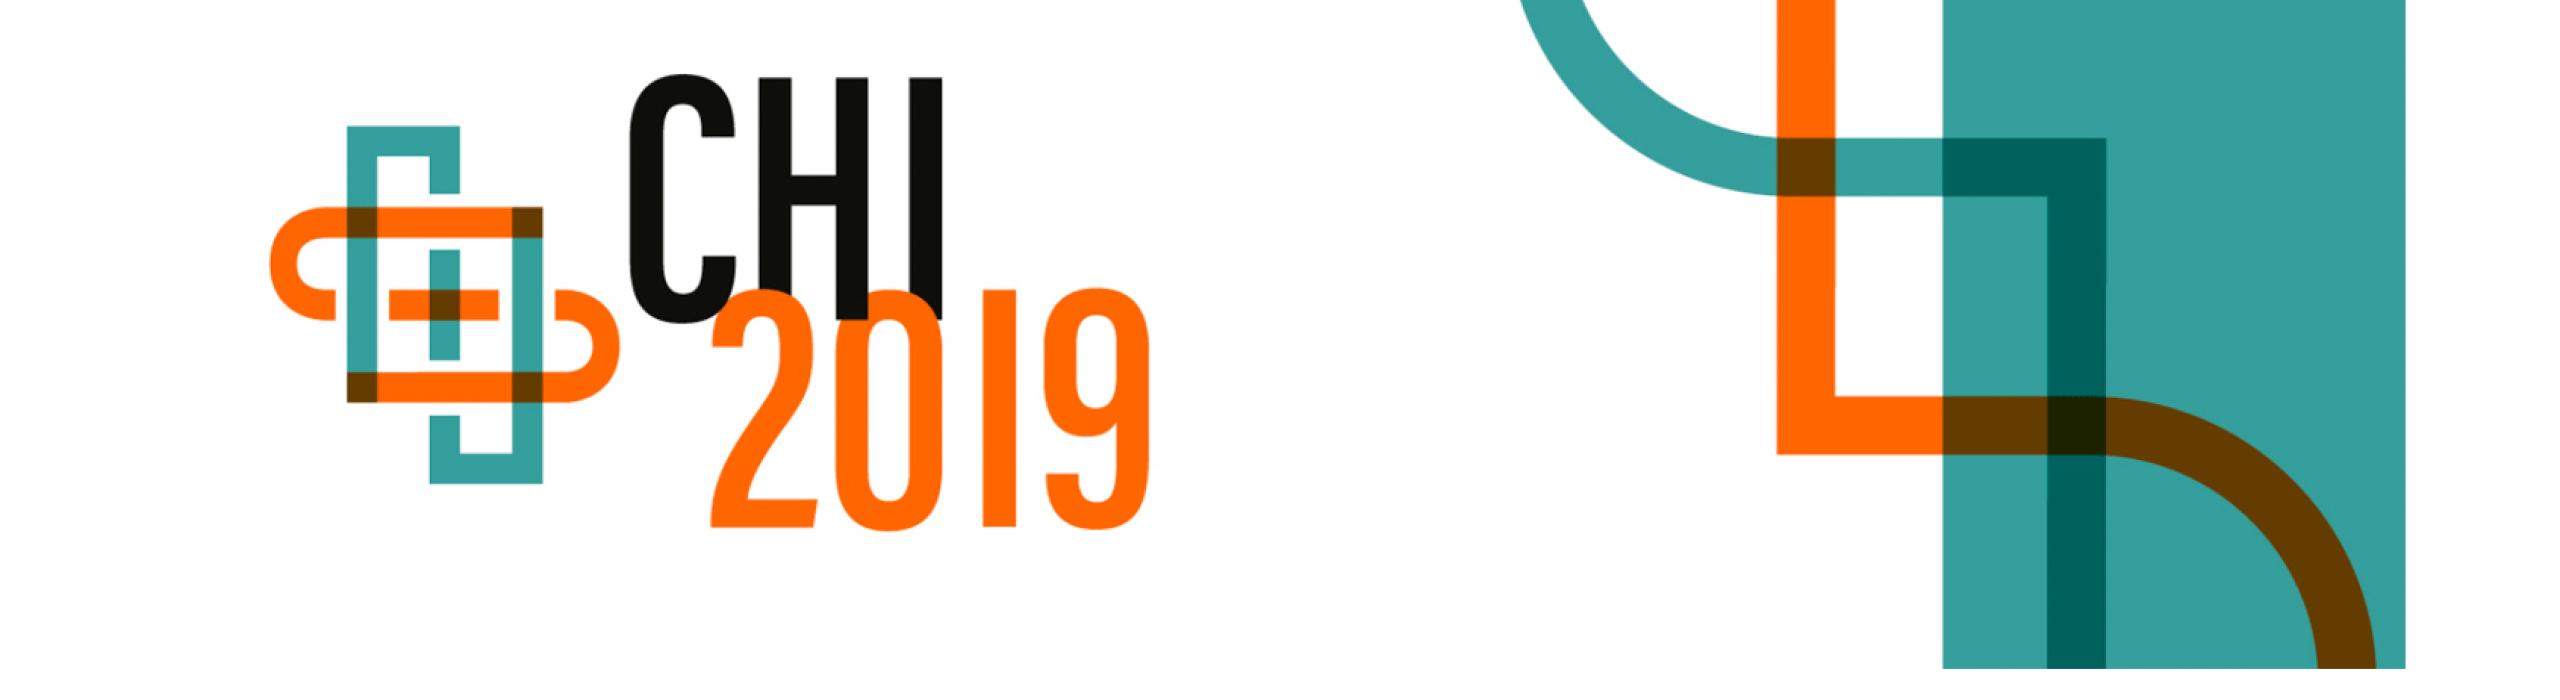 CHI 2019 logo